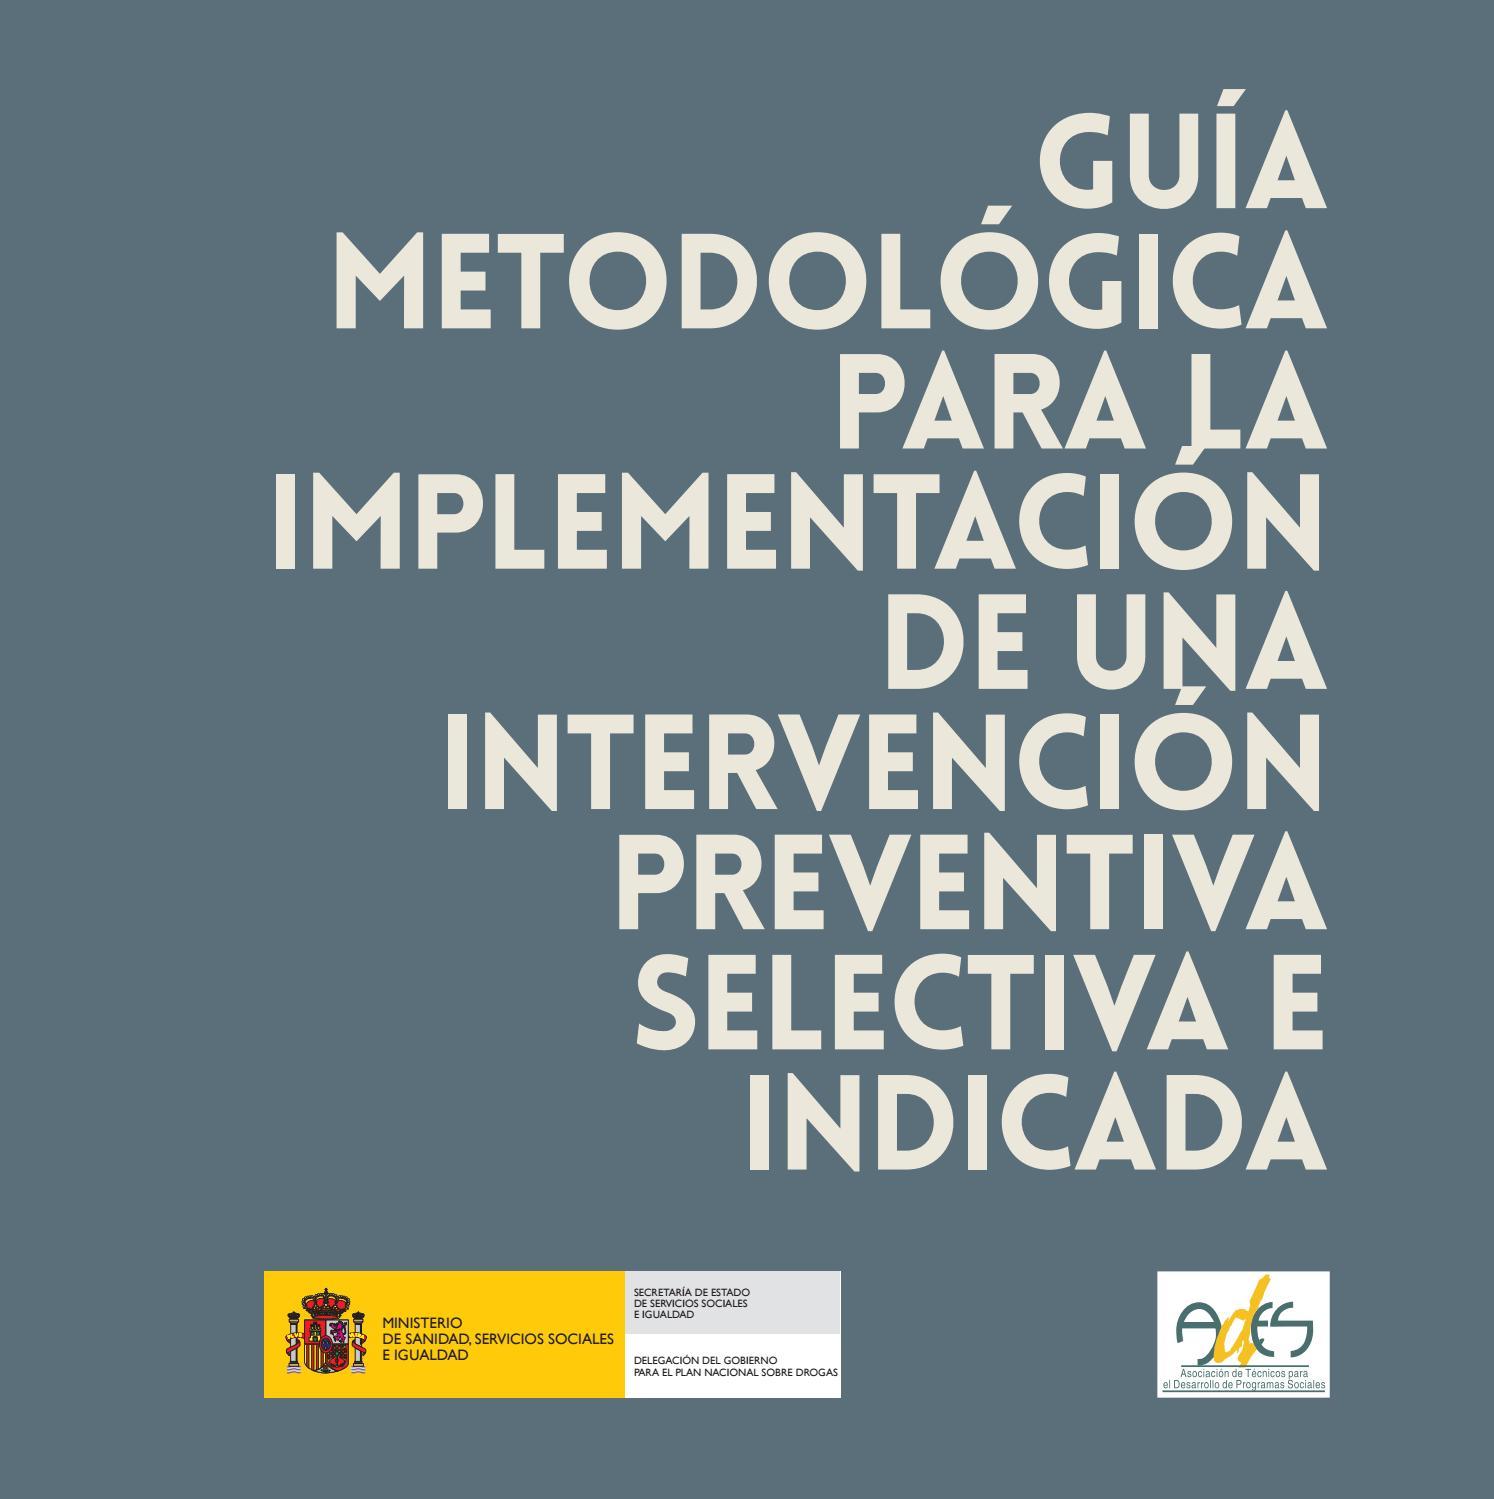 Guia metodologica ades by Jose Carlos Goicochea - issuu